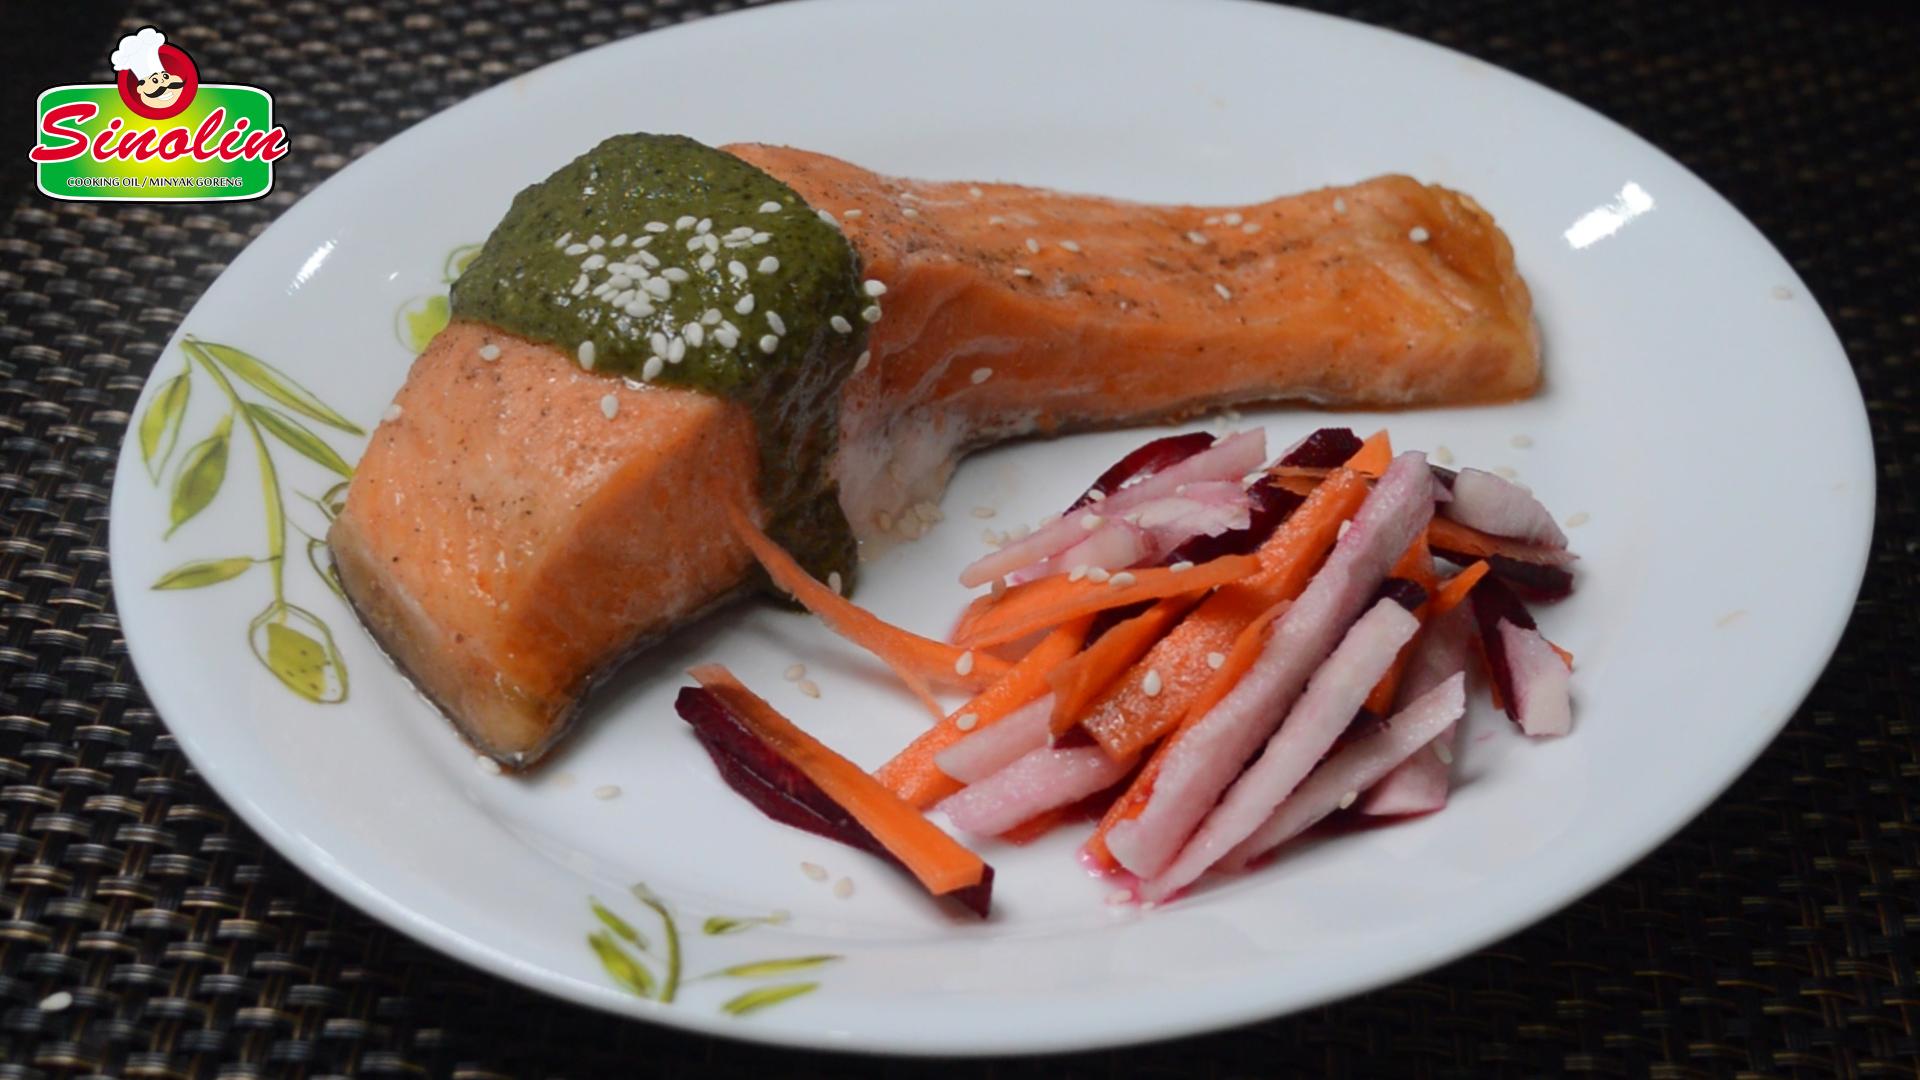 Salmon Panggang Dengan Saus Pesto & Salad Bit Oleh Dapur Sinolin